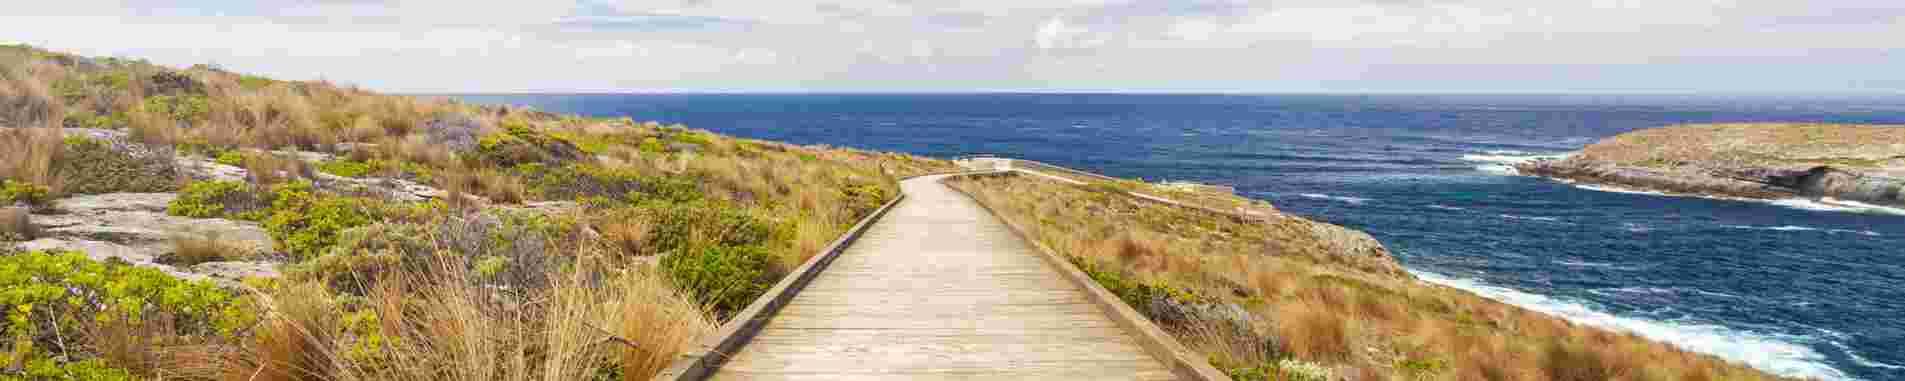 Kangaroo Island header image